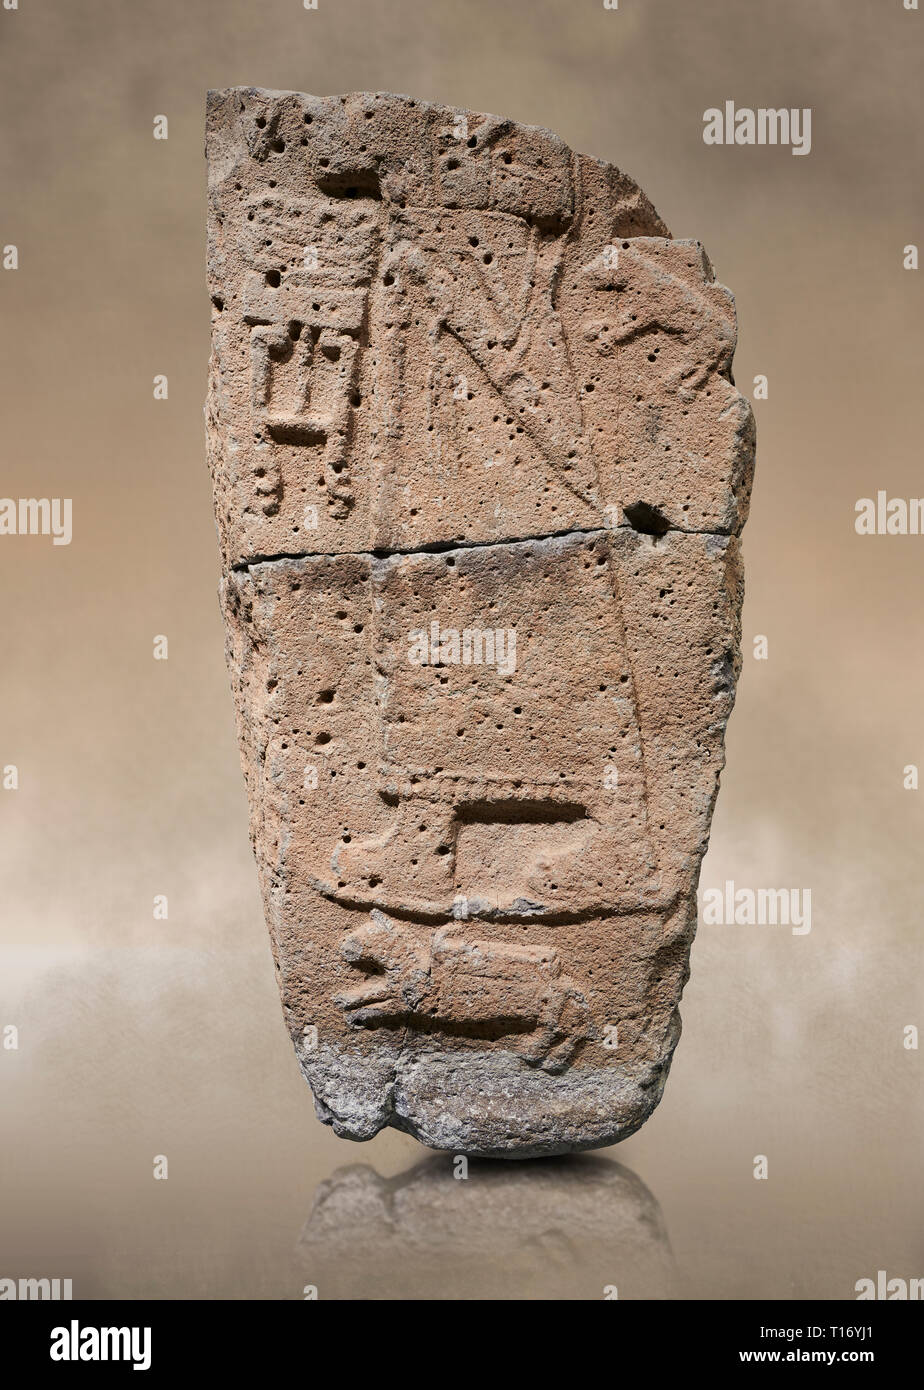 Hittite monumental relief sculpture fragment. Late Hittite Period - 900-700 BC. Adana Archaeology Museum, Turkey. Stock Photo